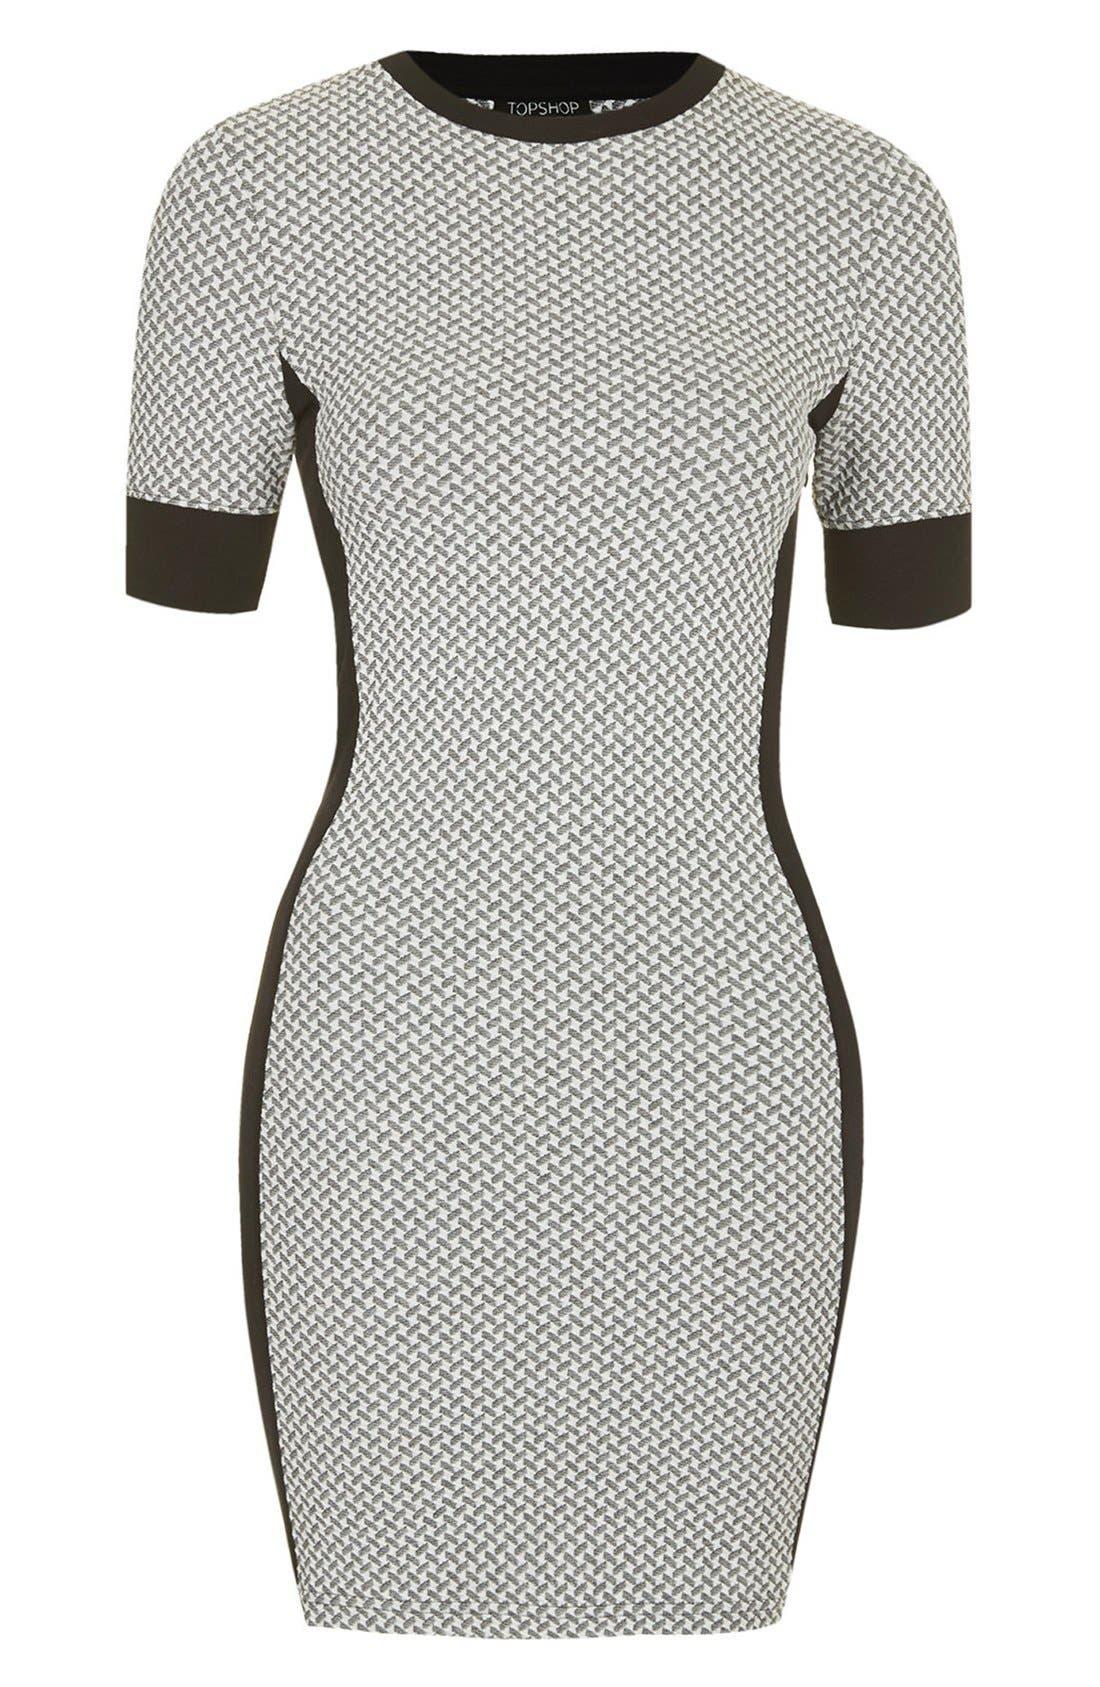 Alternate Image 3  - Topshop Geometric Print Body-Con Dress (Regular & Petite)